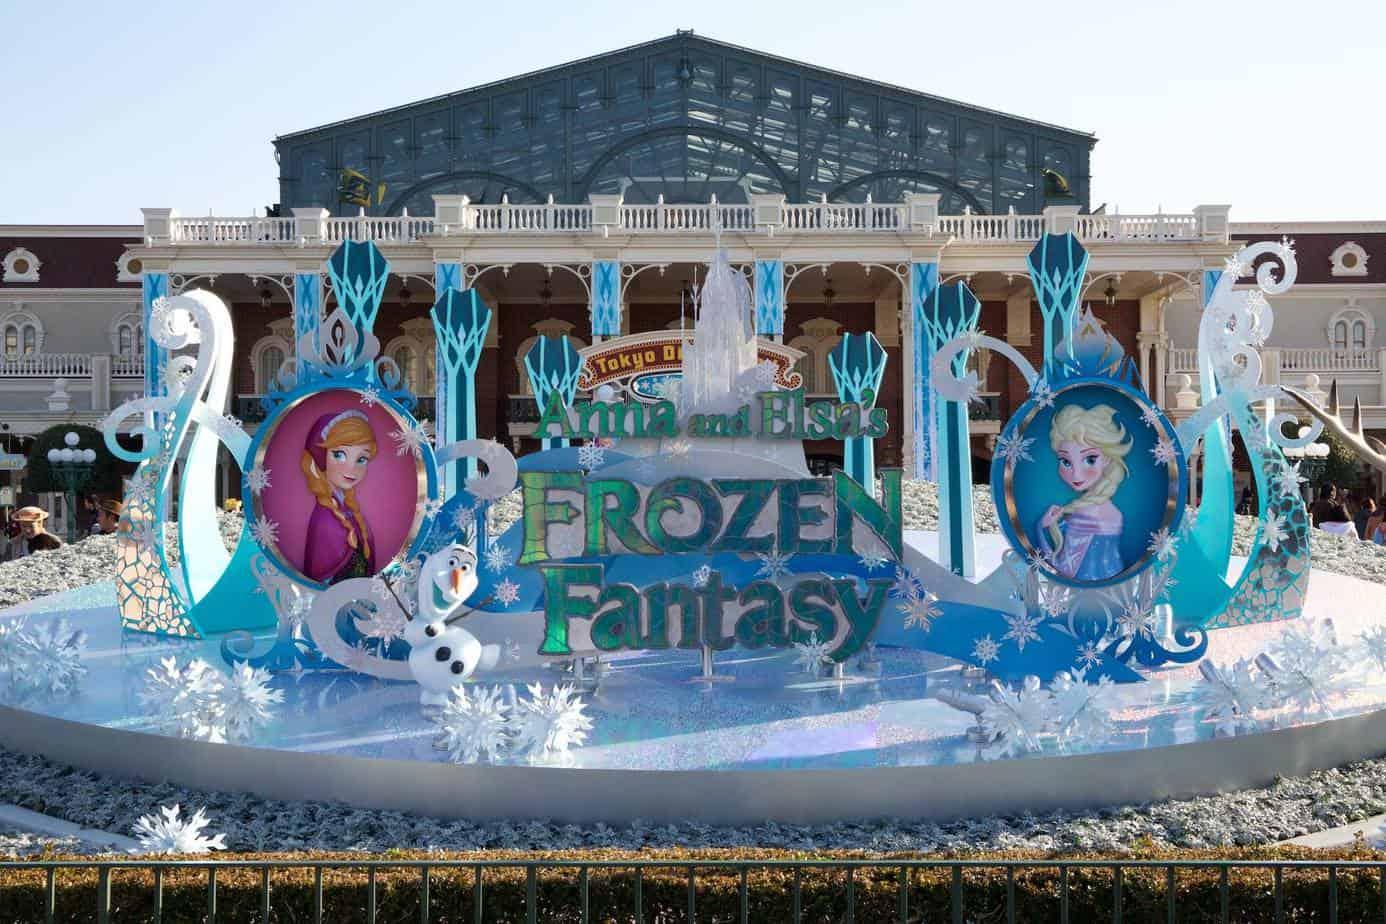 Frozen fantasy sweet duffy 2016 tdr explorer for Princess float ideas